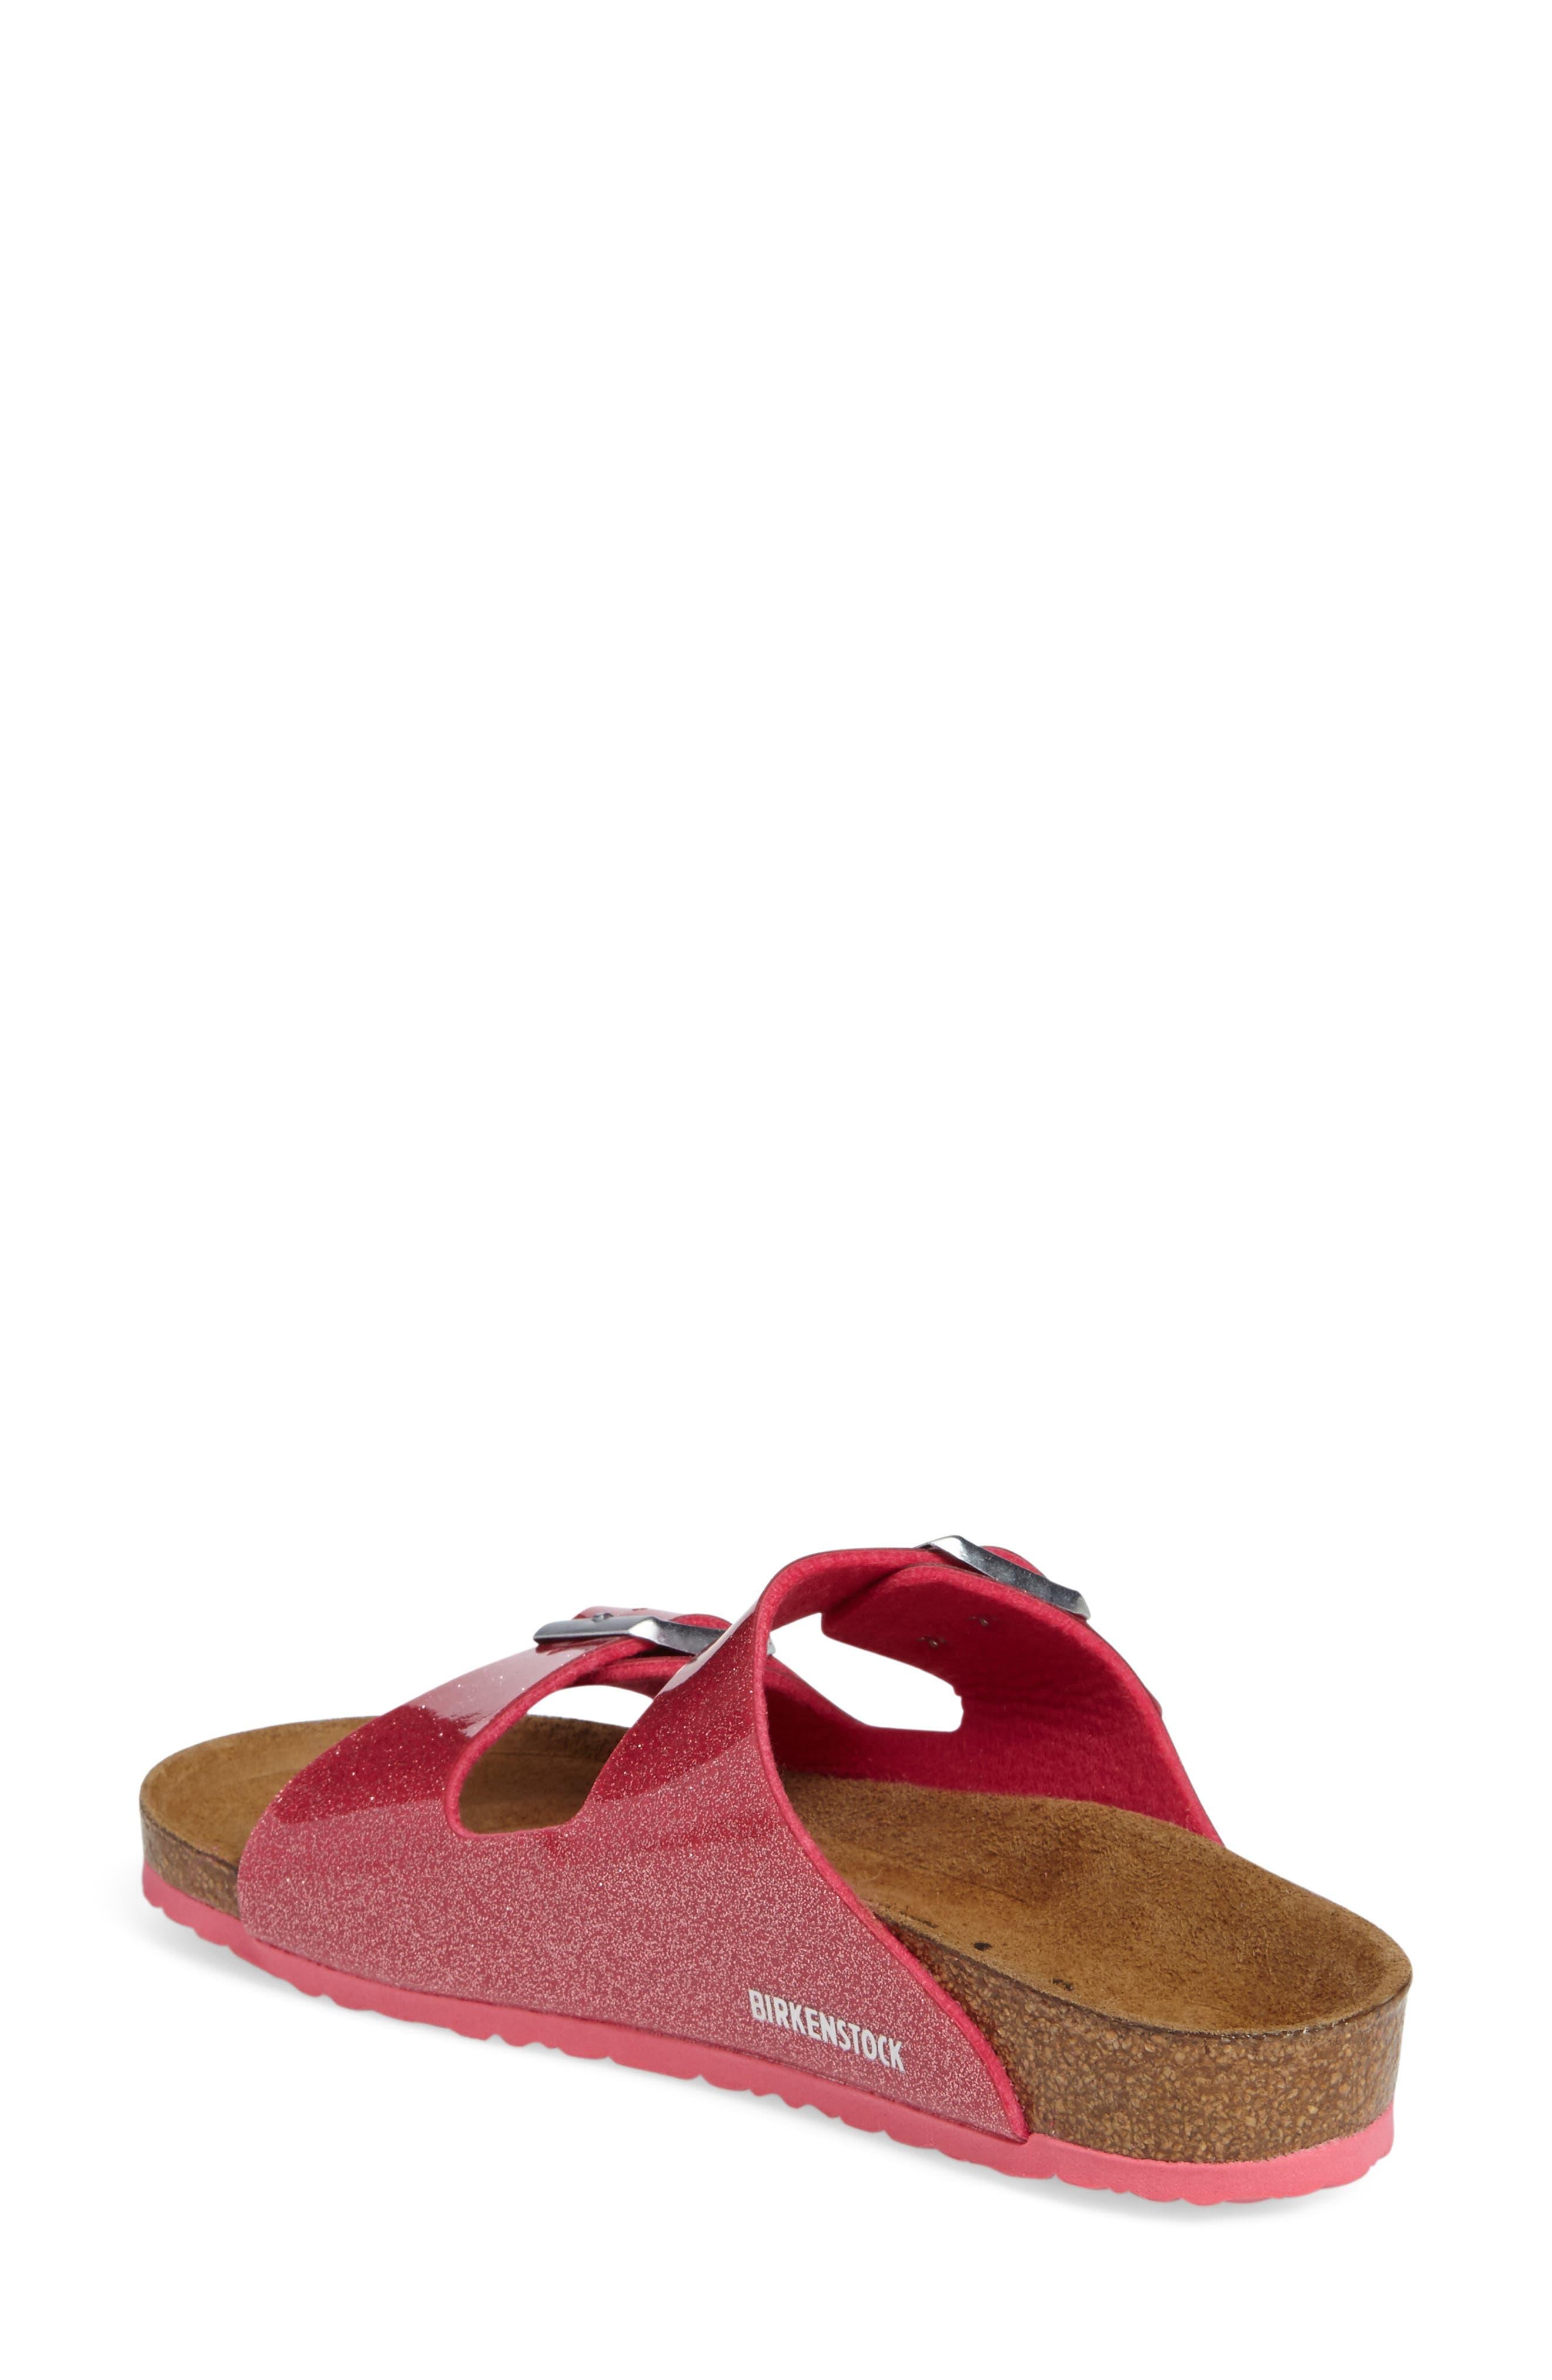 'Arizona Galaxy Birko-Flor' Slide Sandal,                             Alternate thumbnail 8, color,